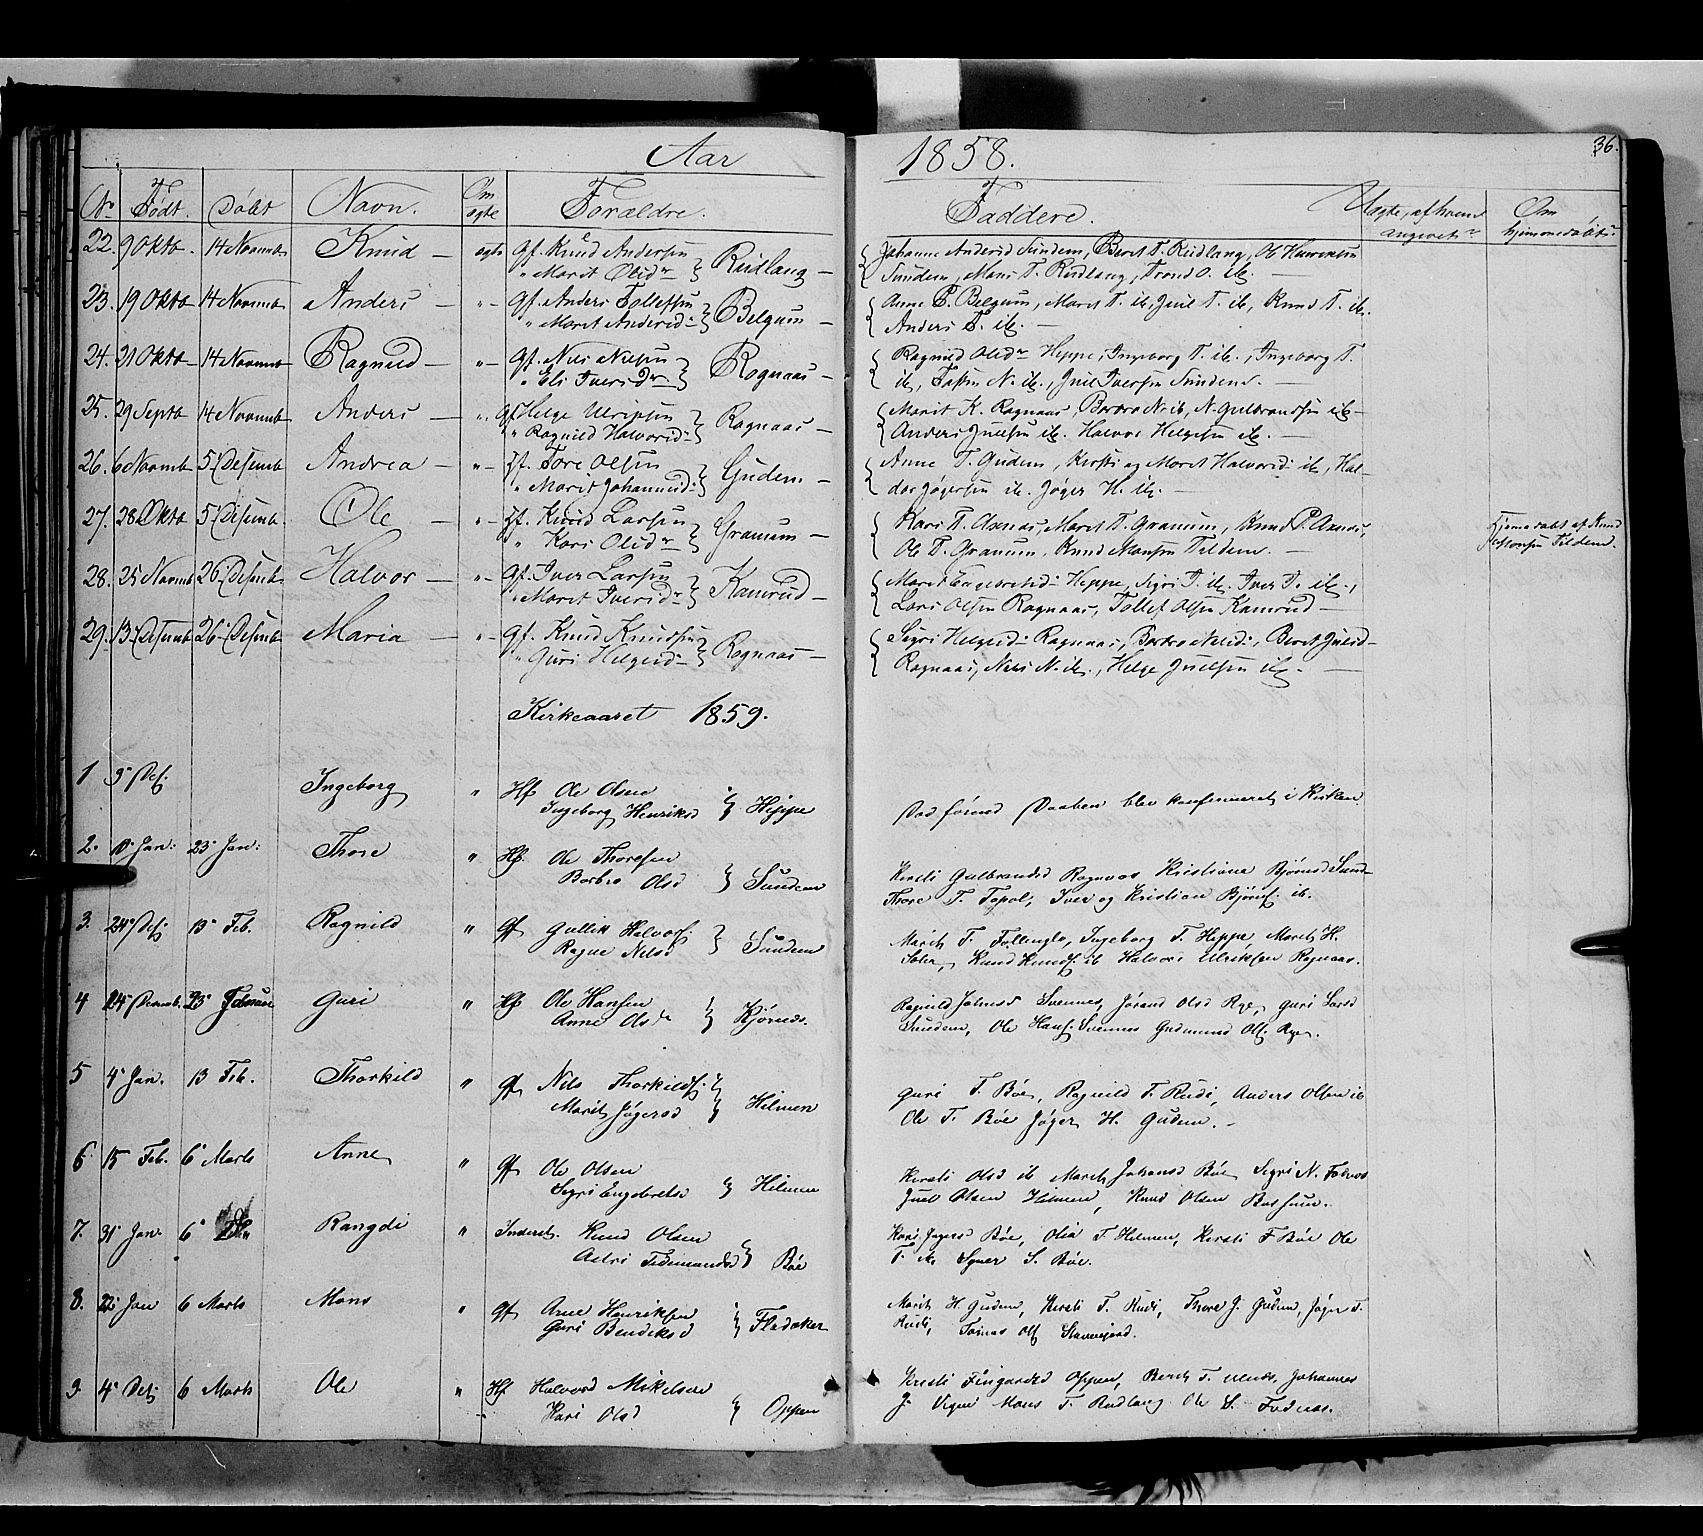 SAH, Nord-Aurdal prestekontor, Ministerialbok nr. 6, 1842-1863, s. 36